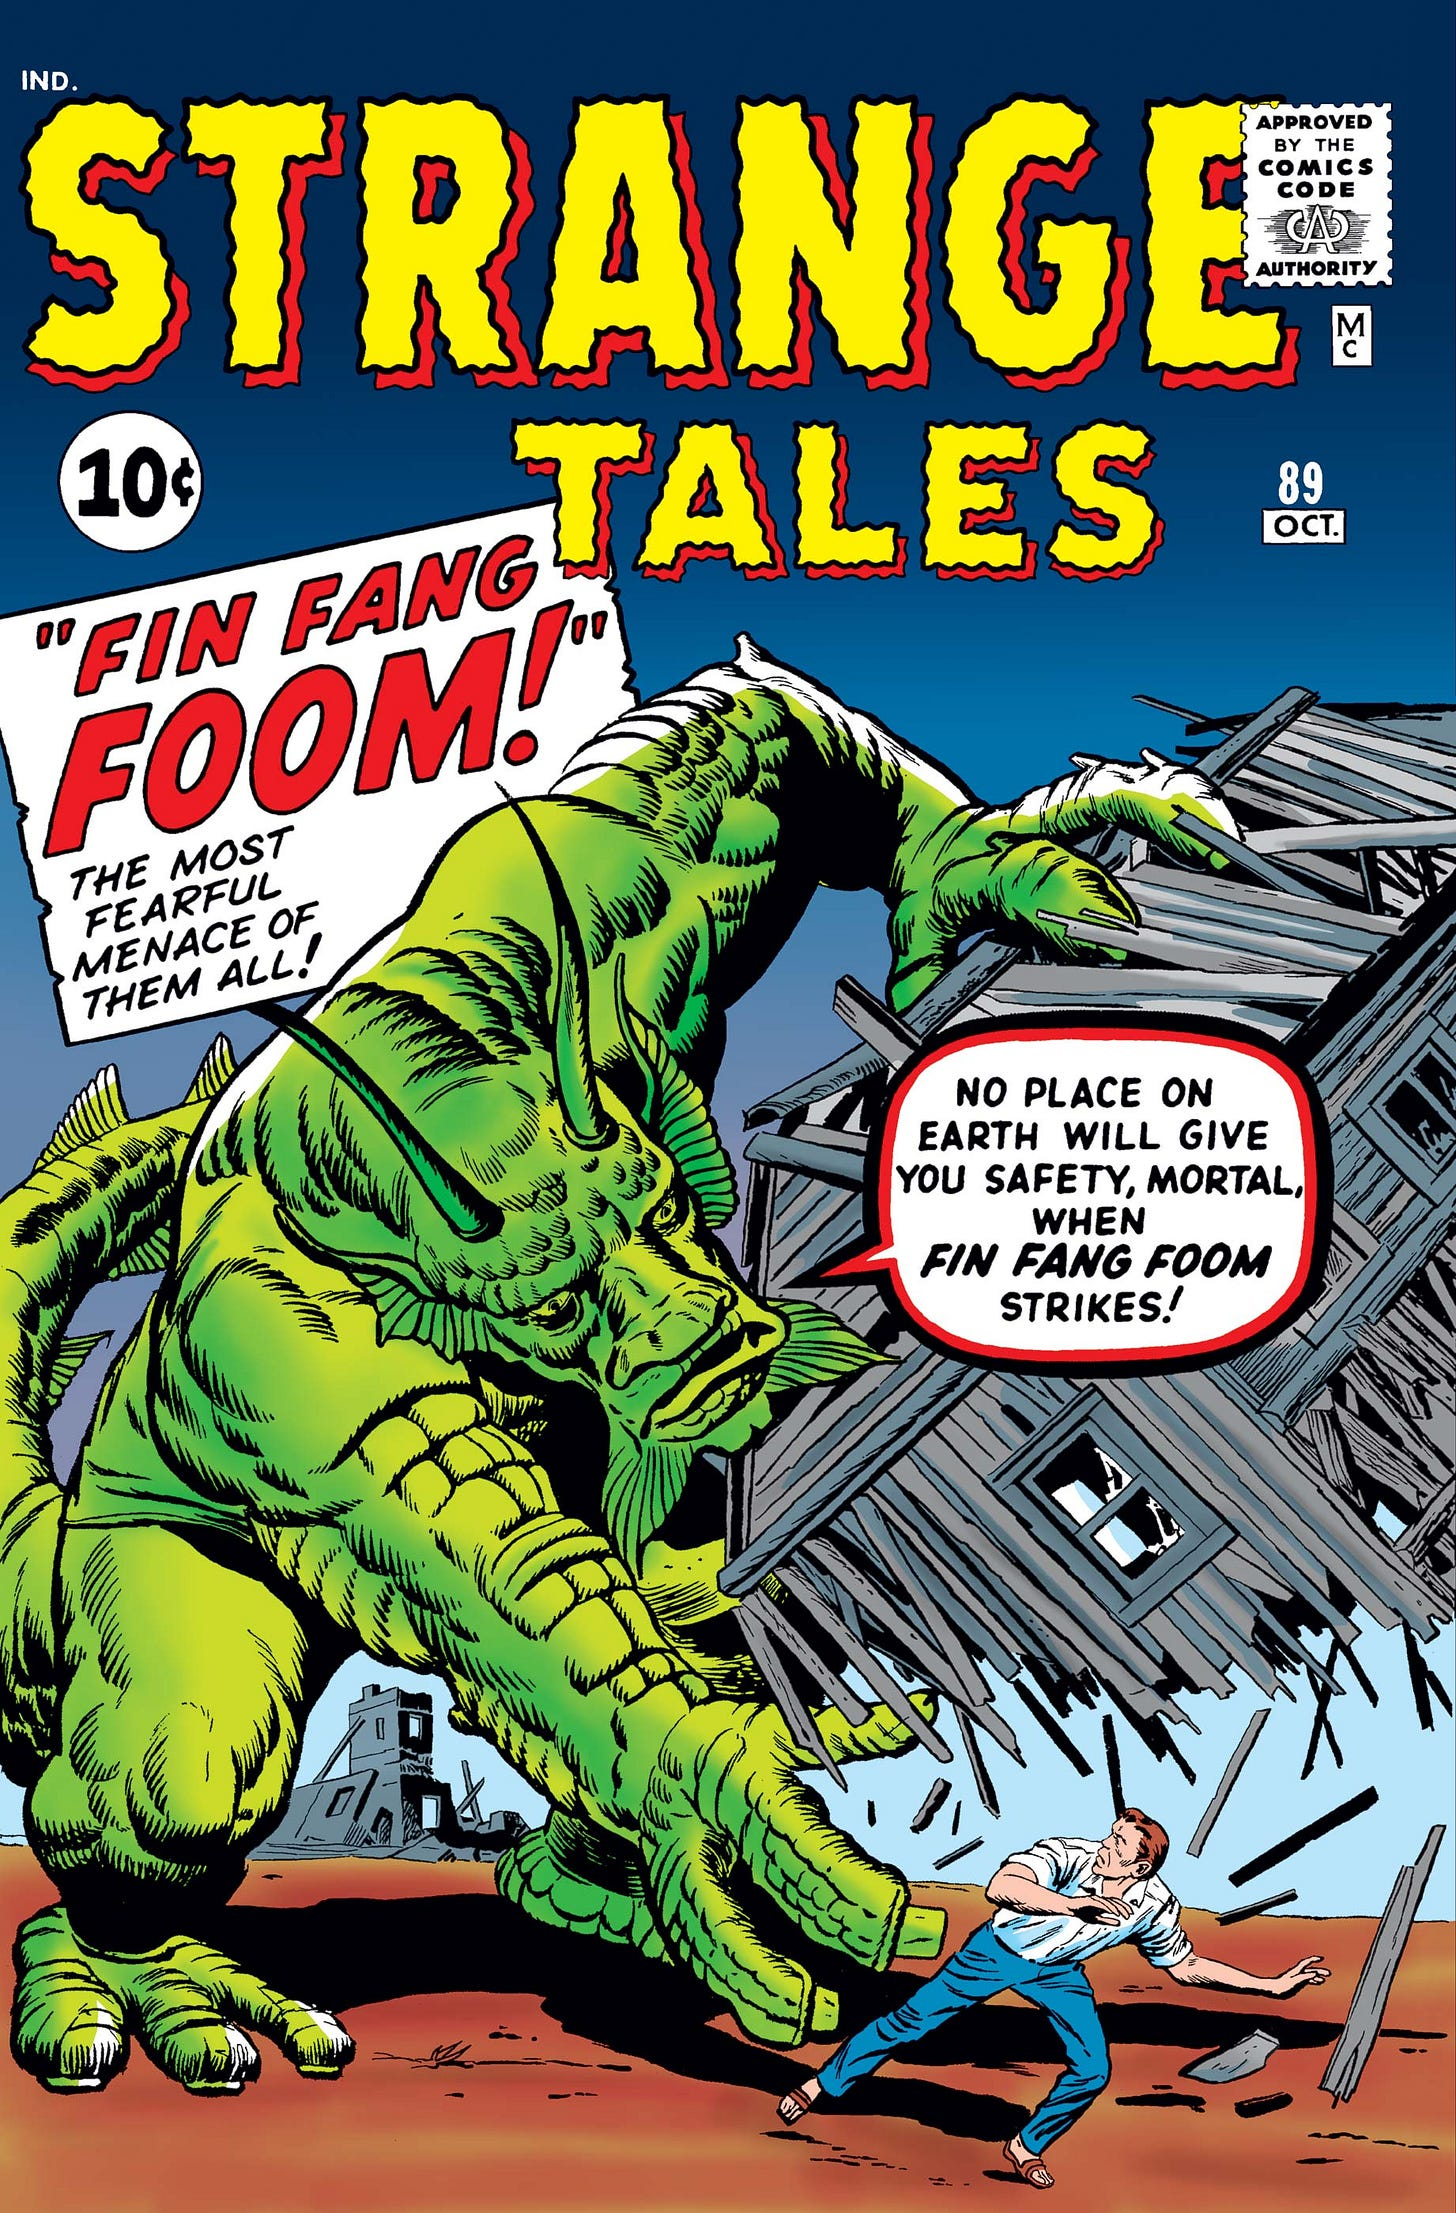 Strange Tales (1951) #89   Comic Issues   Marvel